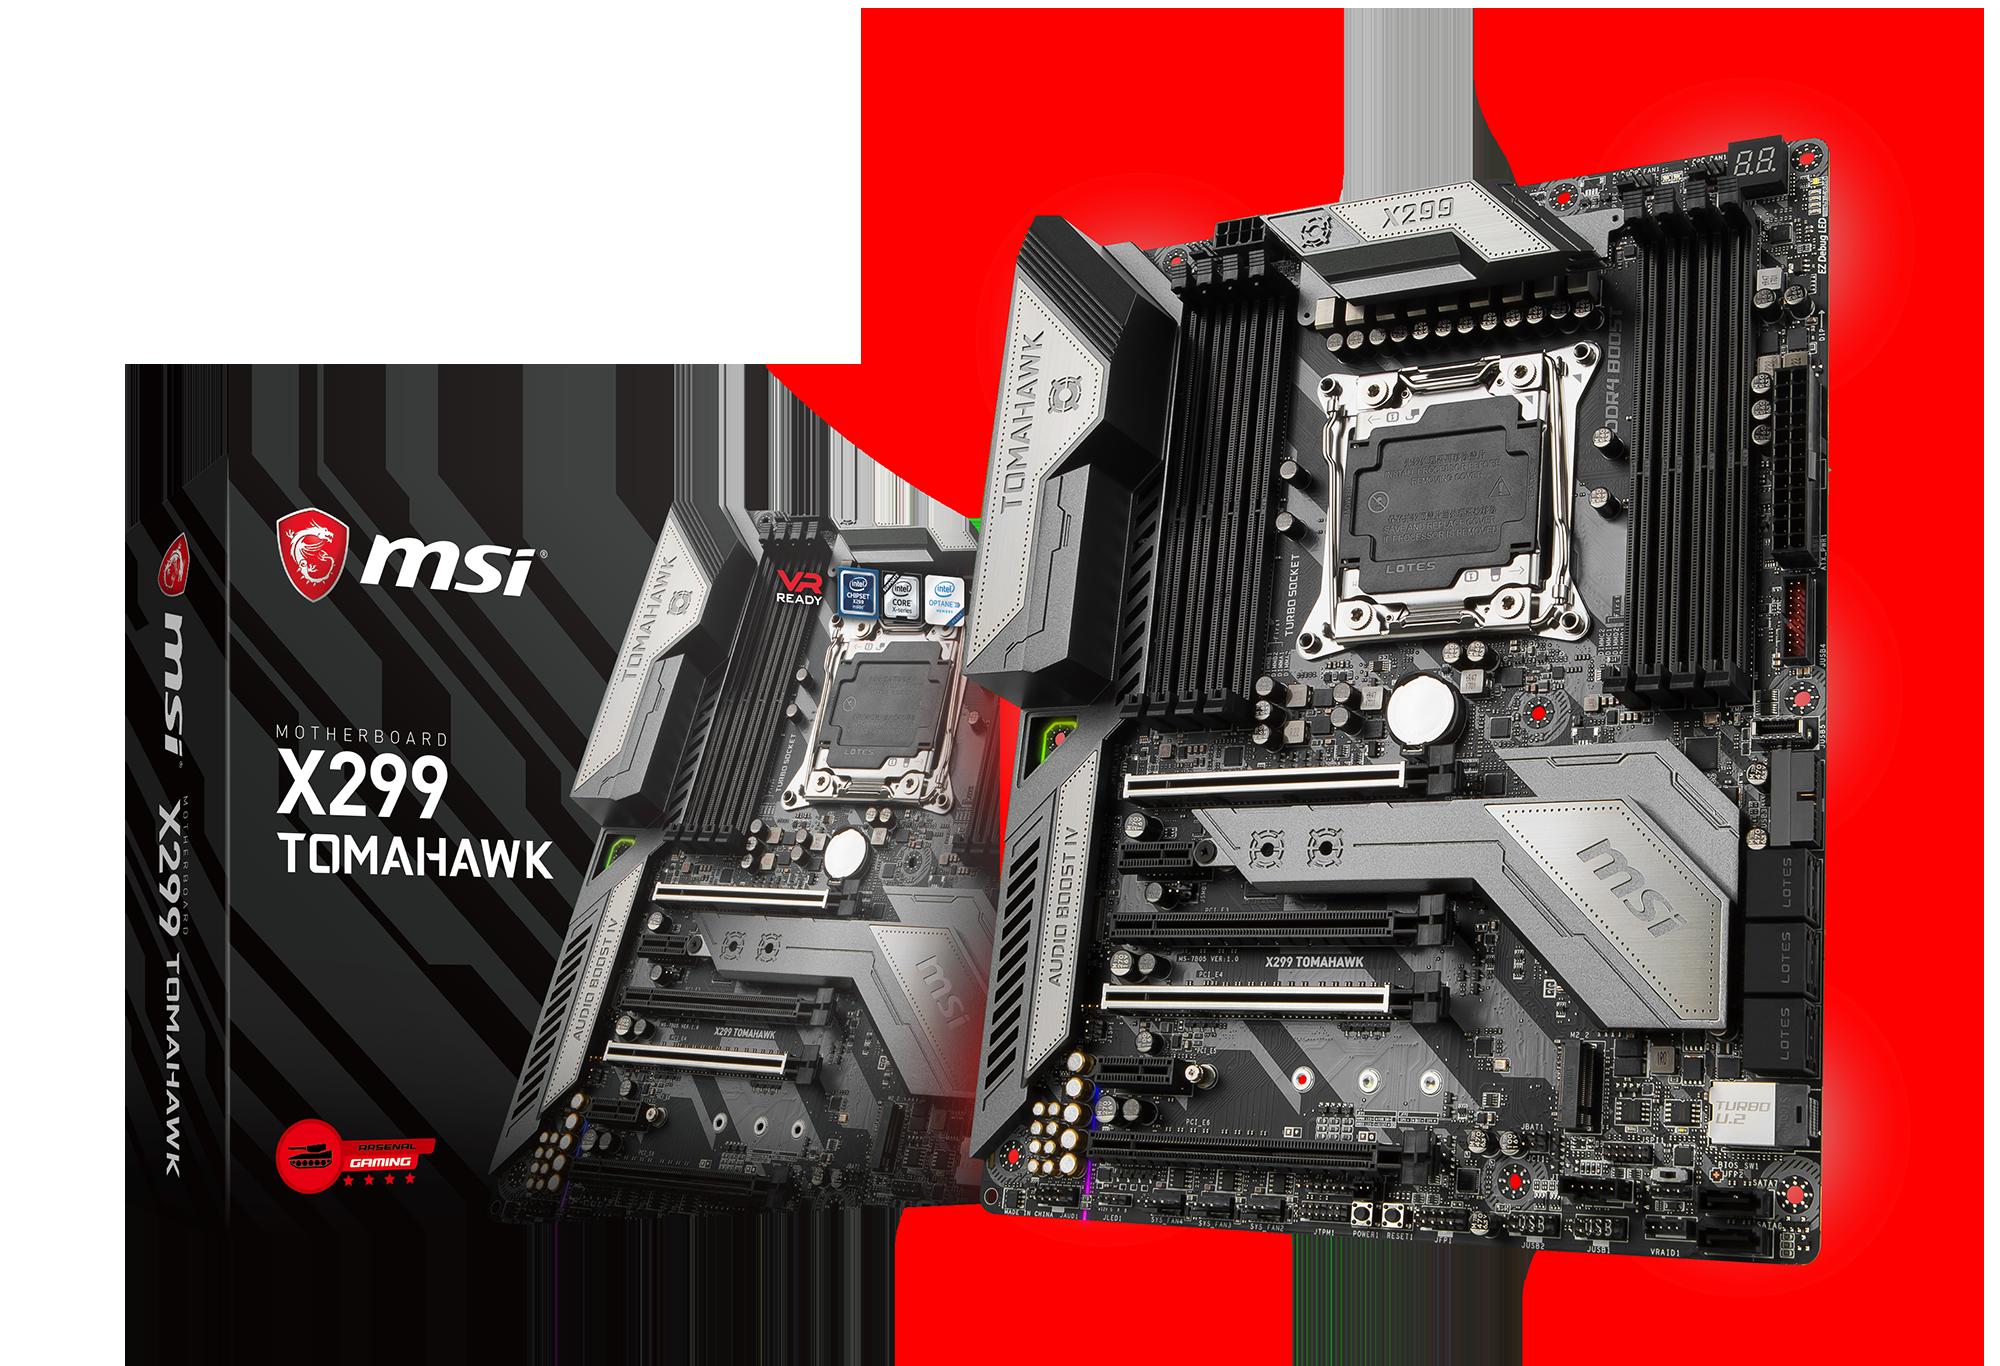 MSI X299 TOMAHAWK - Motherboard